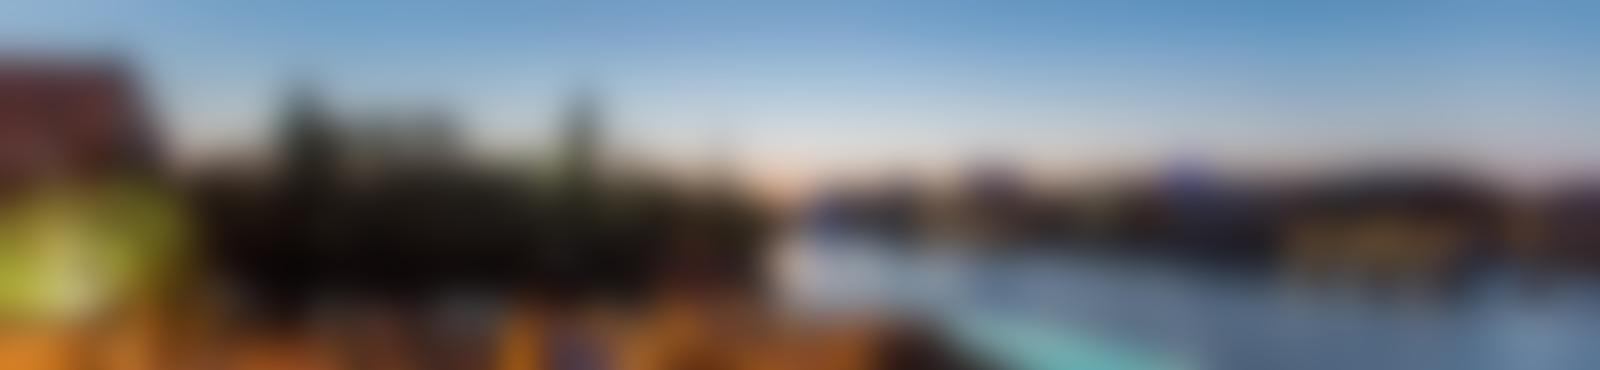 Blurred 87d013e3 2b80 4dd5 bc1d 57b73a42fbae